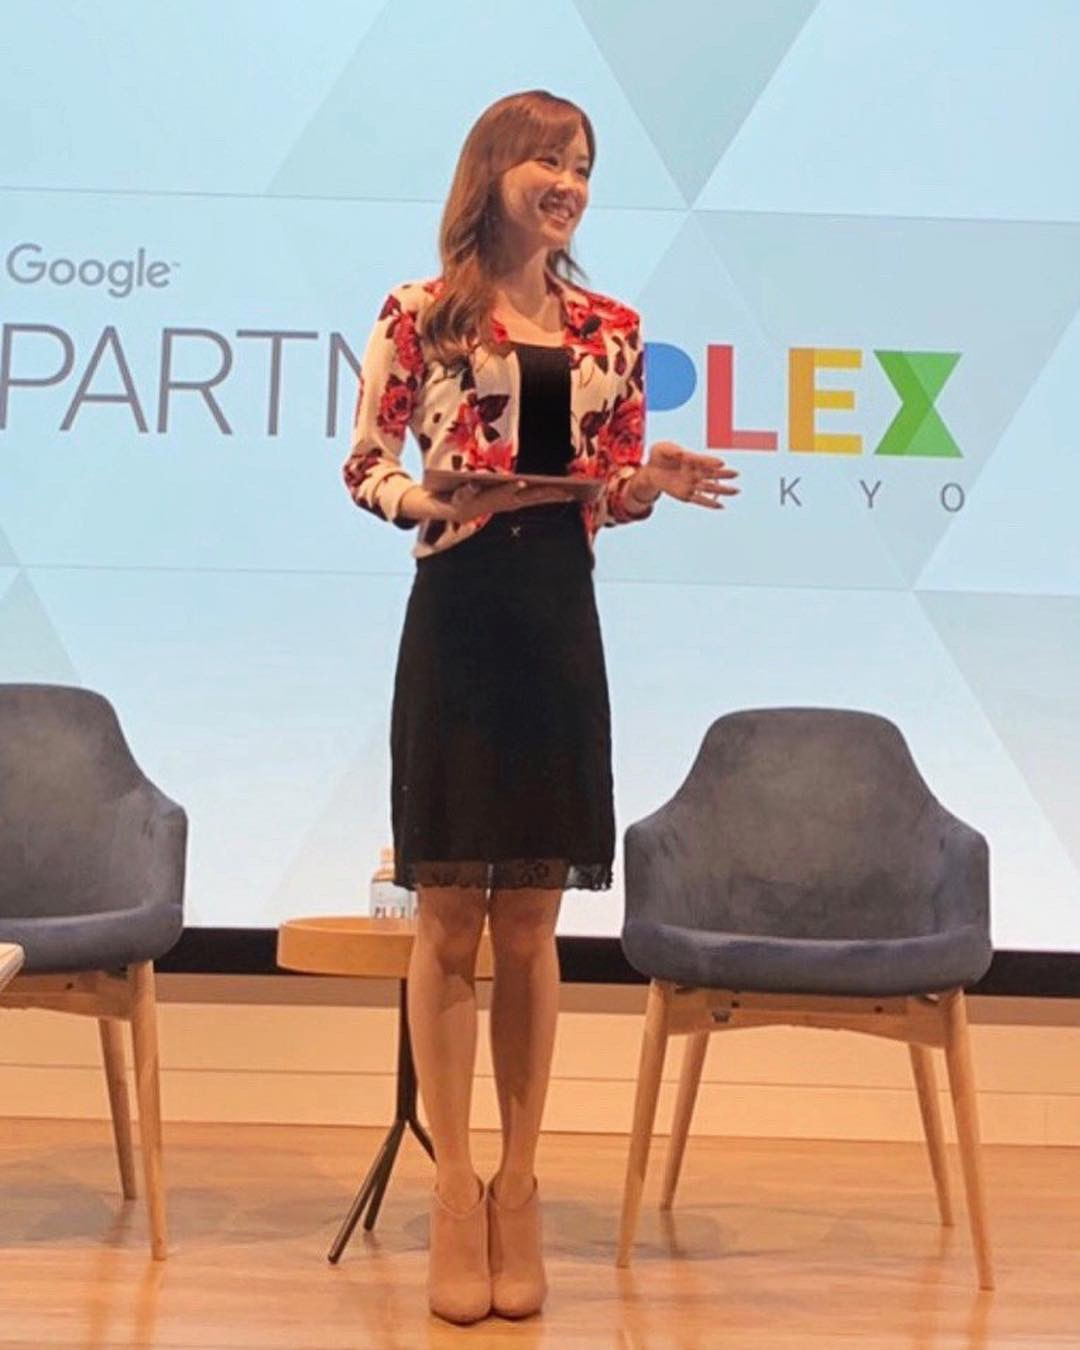 Emceeing at Google Partner Plex